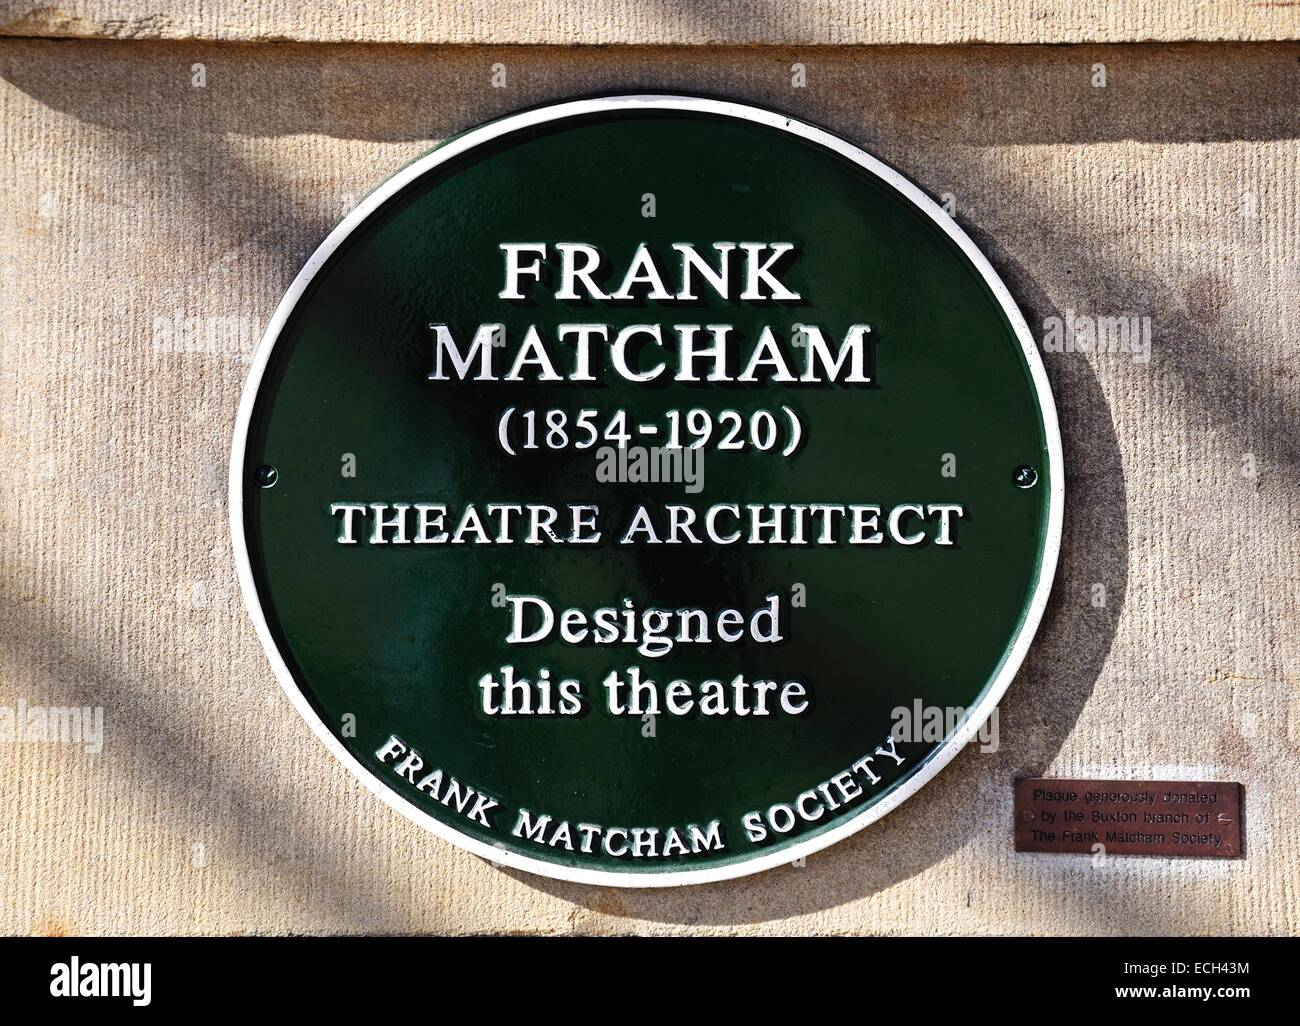 Frank Matcham theatre architect sign for the Opera House, Buxton, Derbyshire, England, UK, Western Europe. - Stock Image